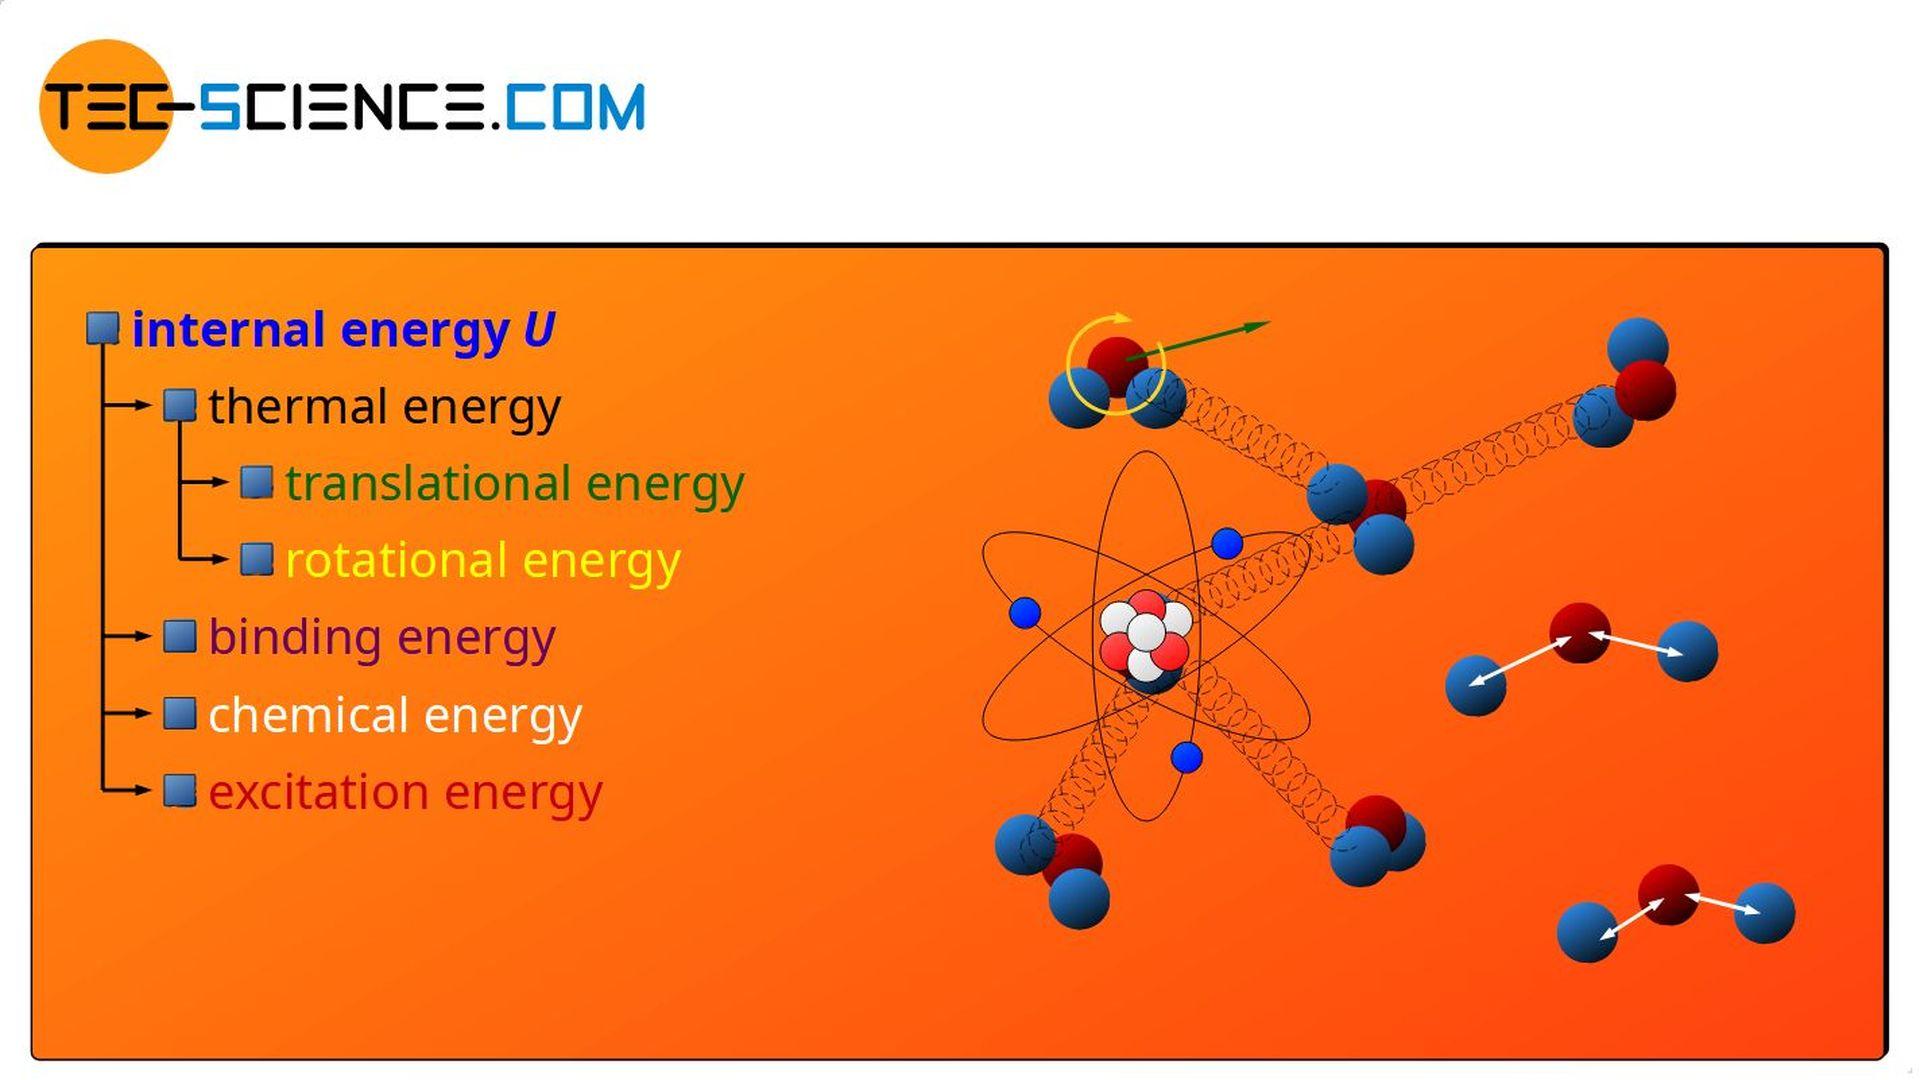 Internal energy (incomplete)